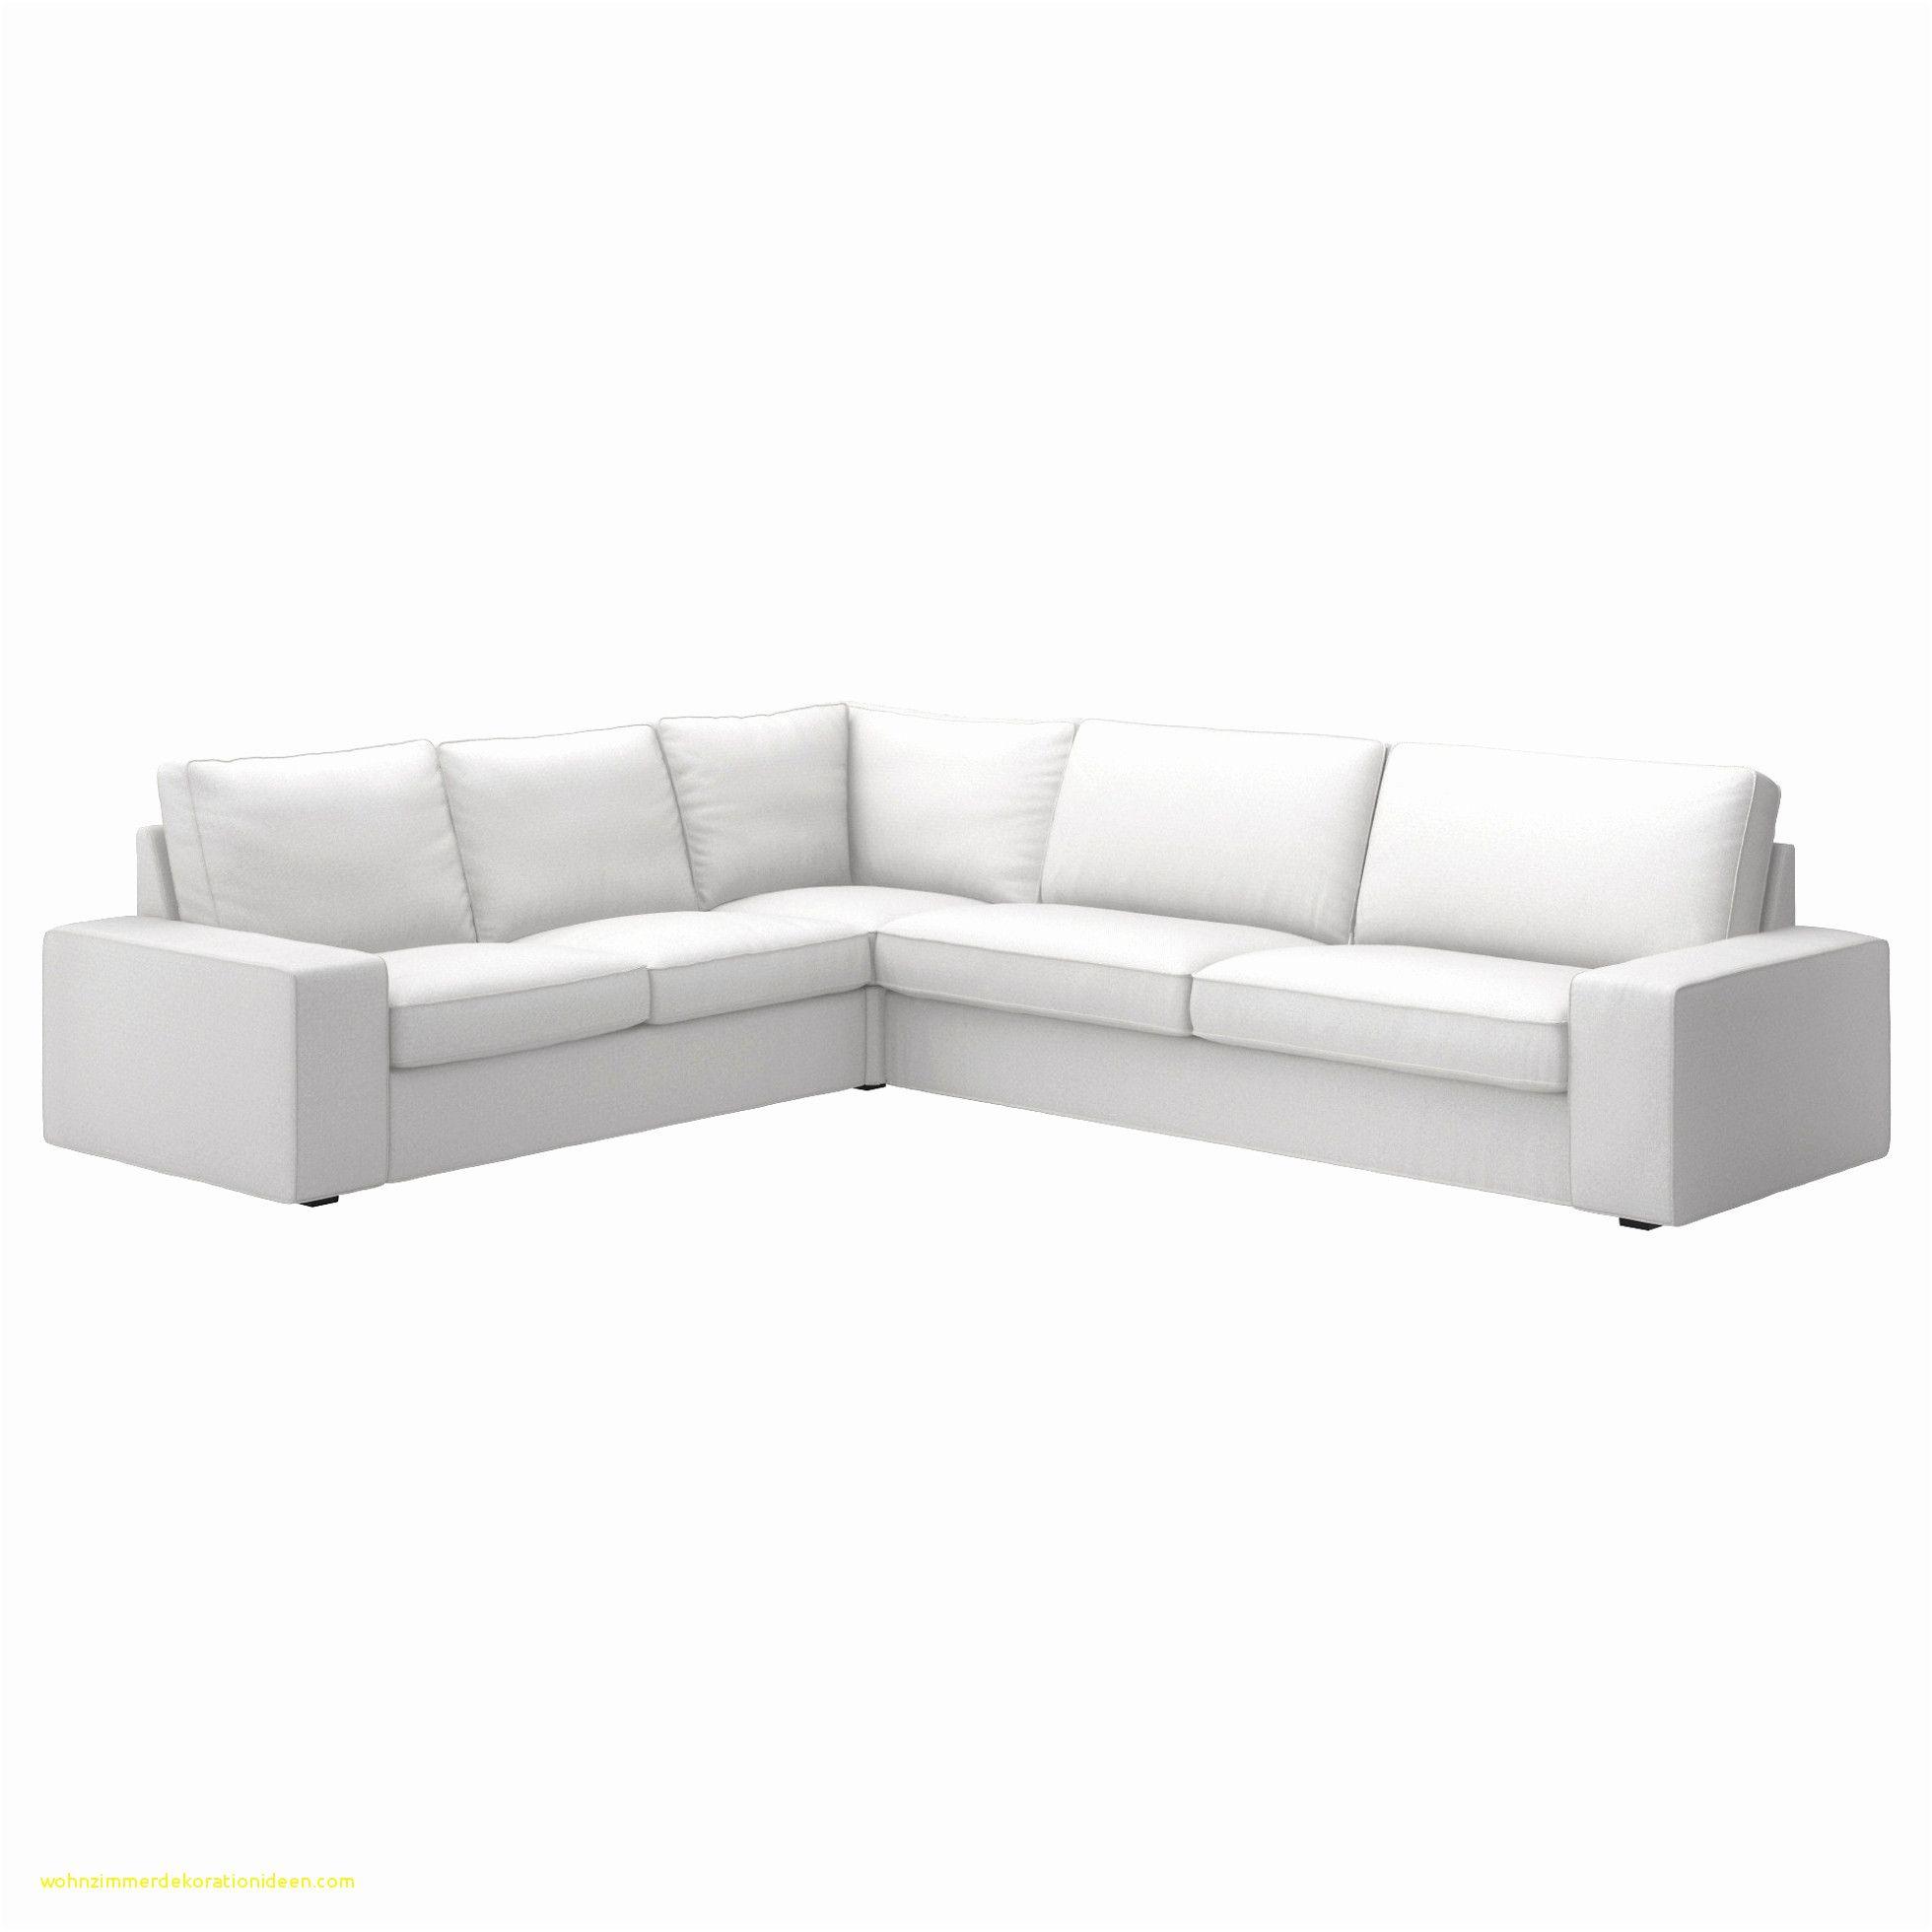 Komplett Eckcouch Mit Sessel White Sofa Set White Sofa Living White Furniture Living Room